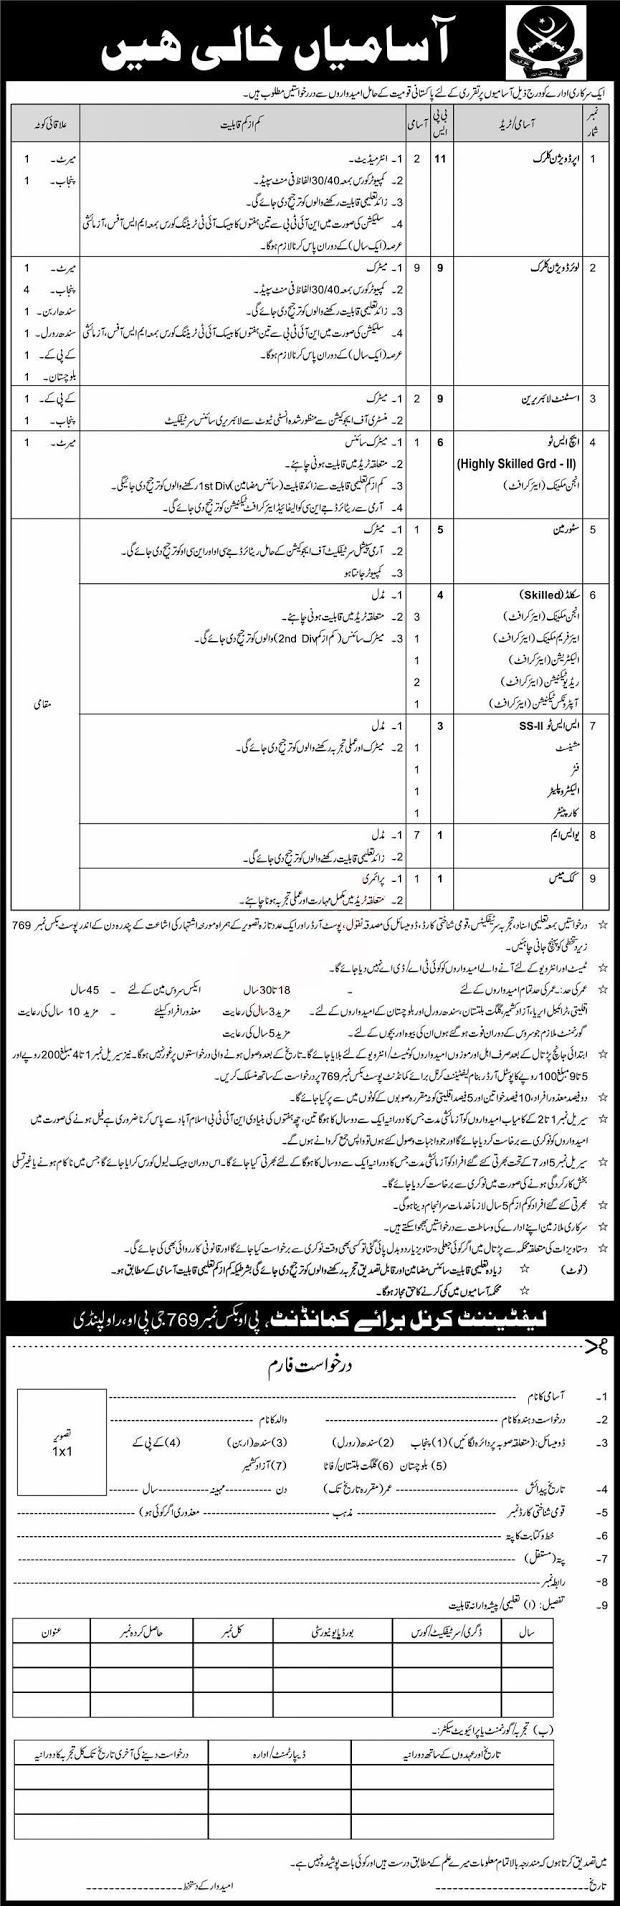 LDC UDC Jobs in Pak Army 2020